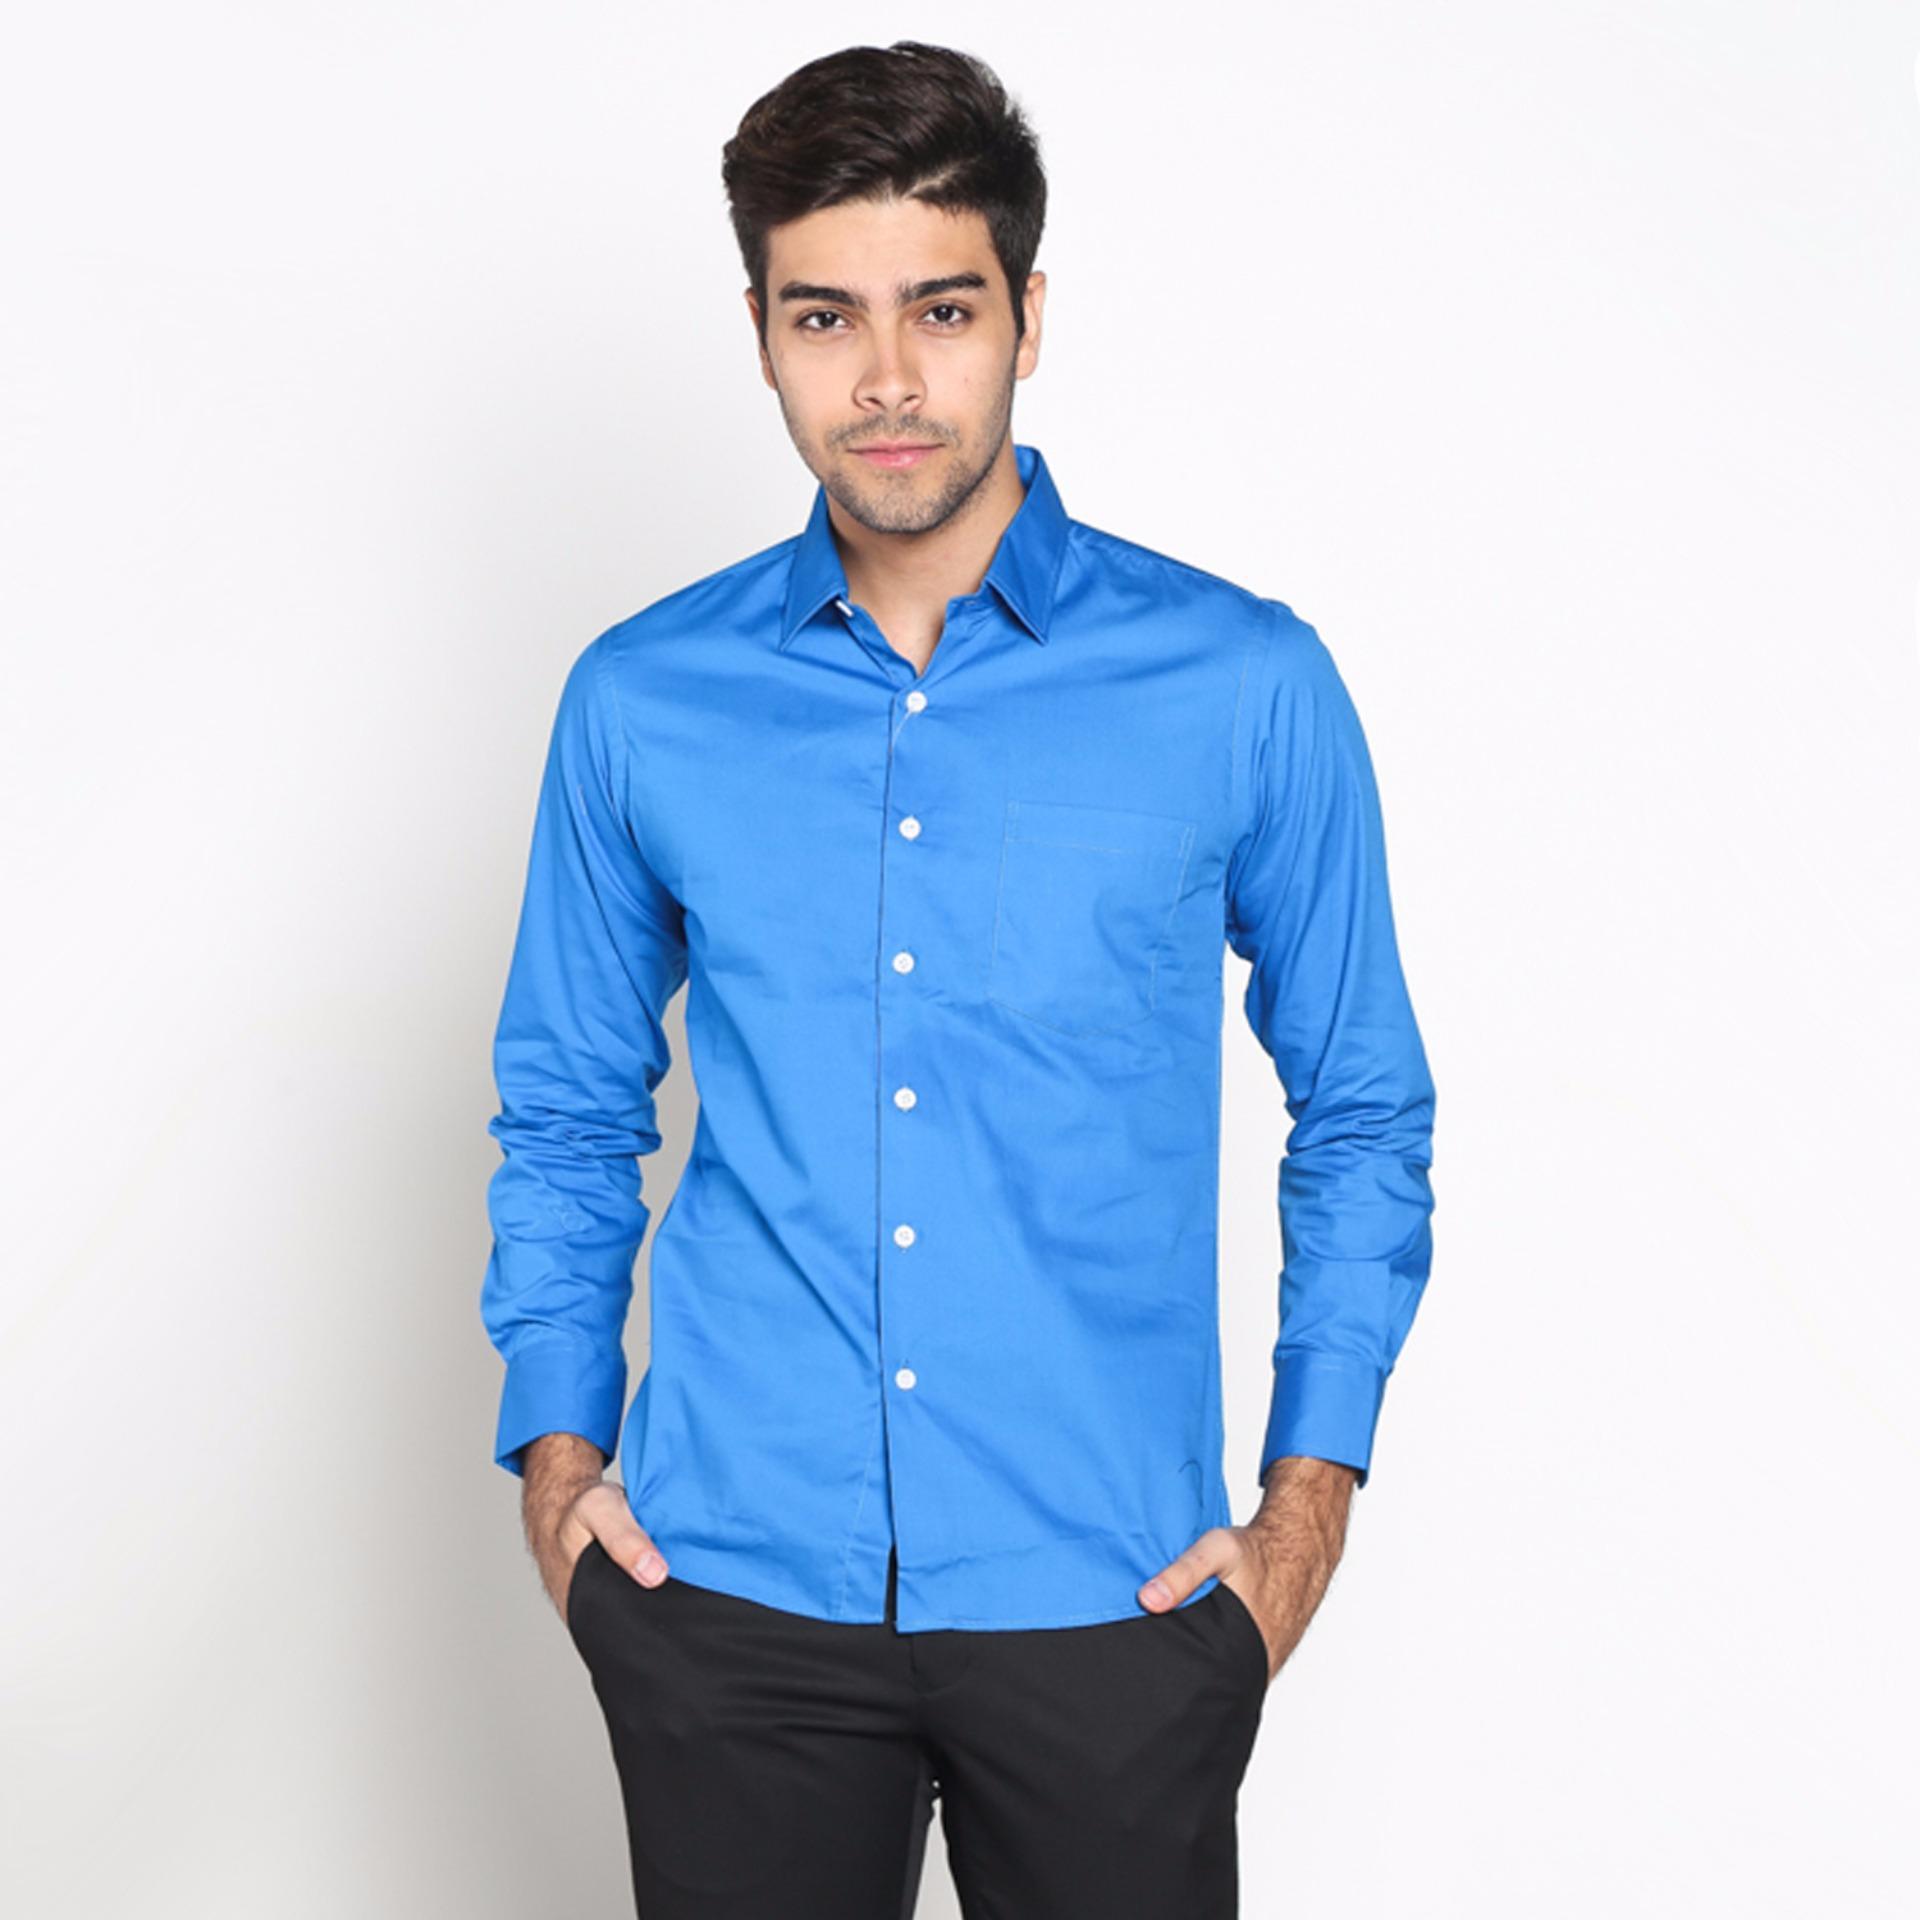 Vm Kemeja Formal Polos Slimfit Panjang Royal Blue Daftar Harga Fbw Clayton Long Sleeve Batik Shirt Cokelat